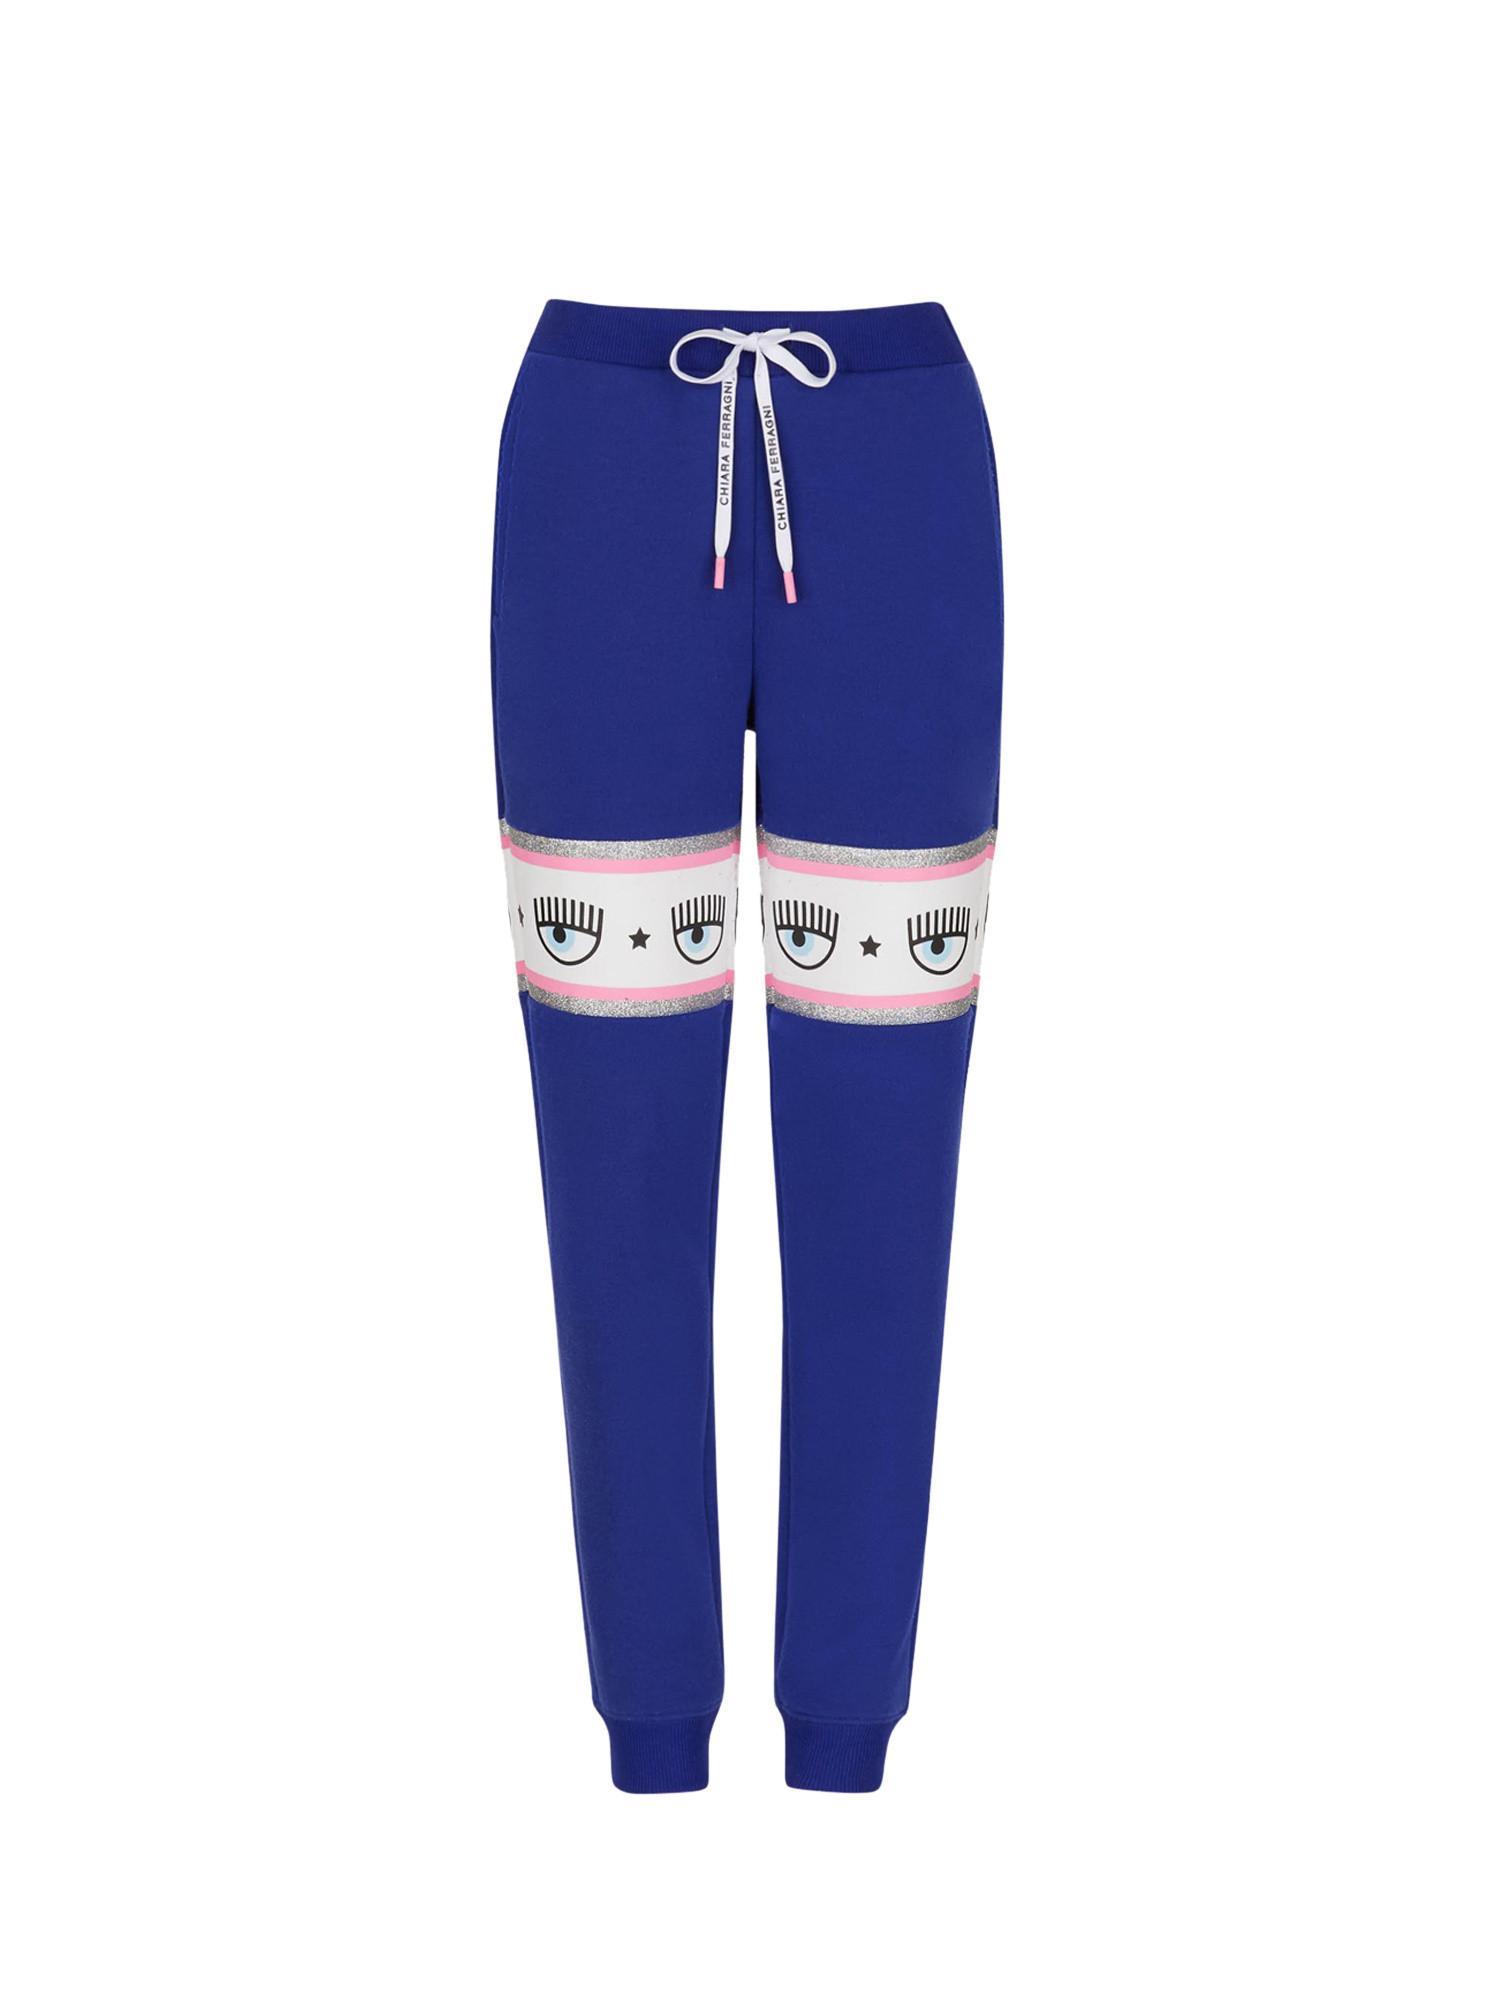 Pantalone tuta Logomania, Blu, large image number 0